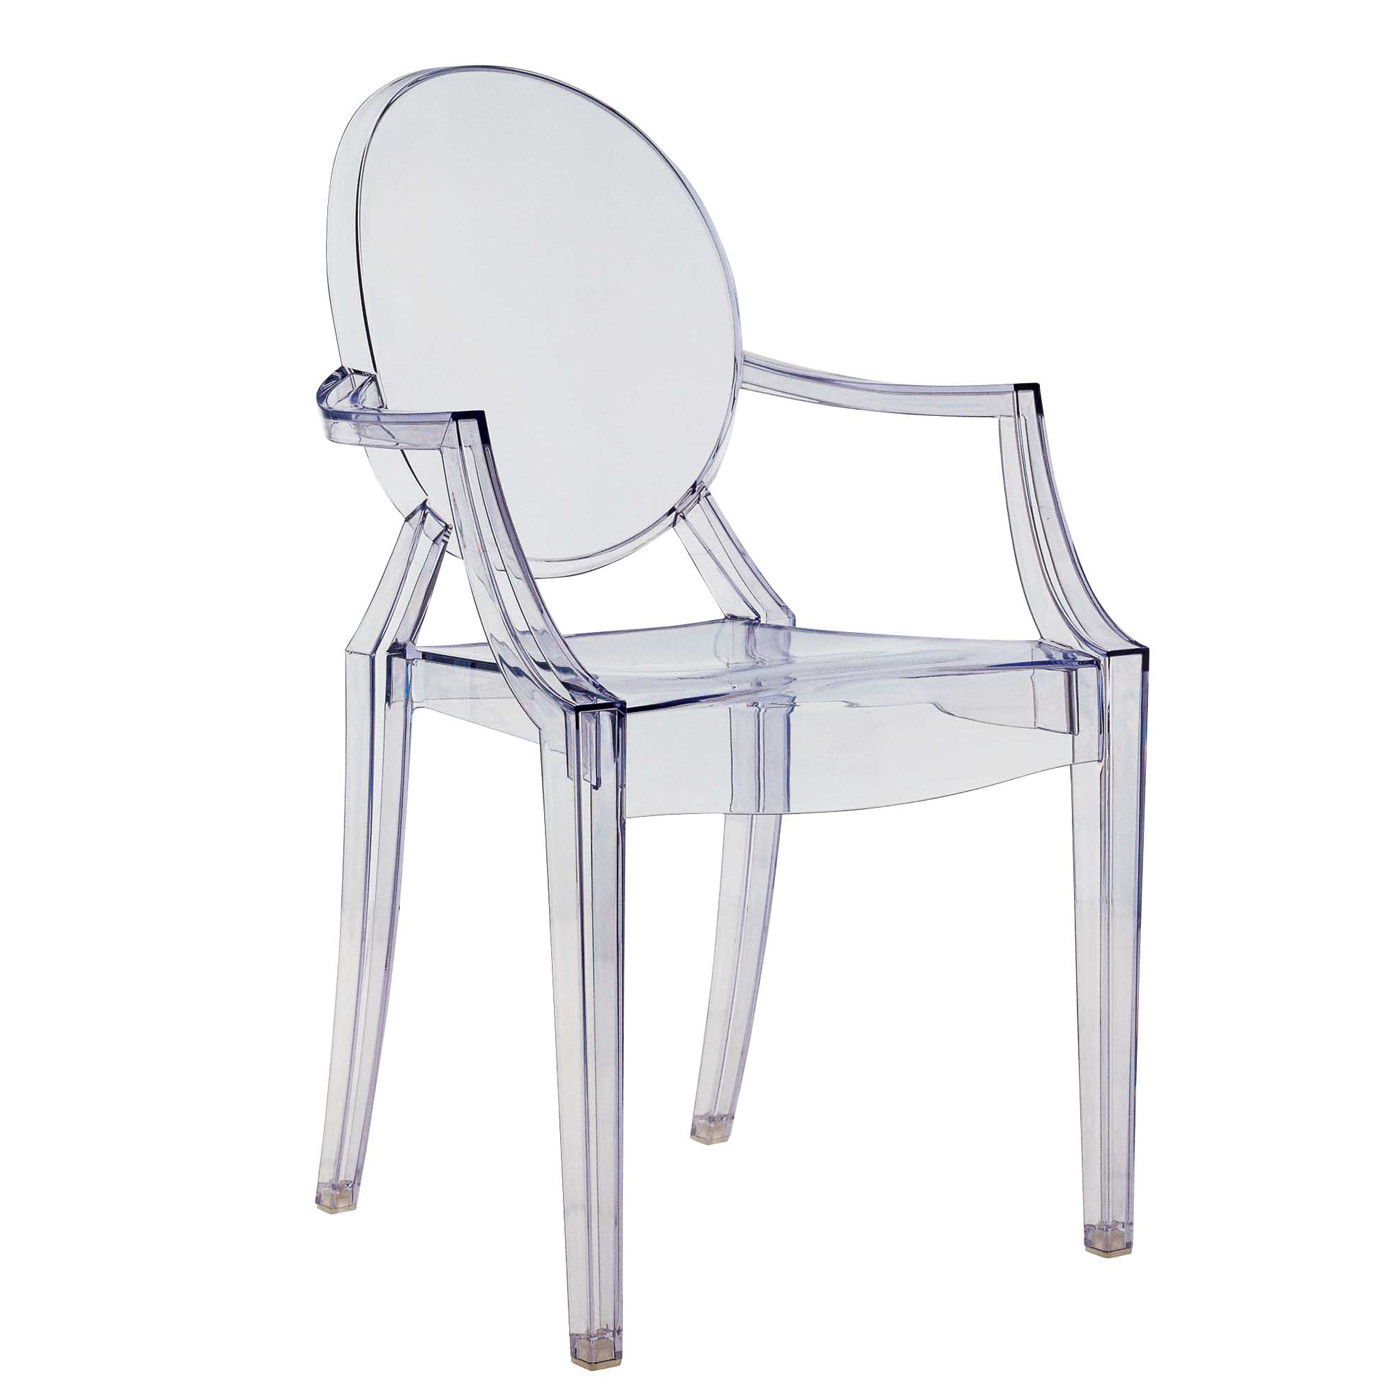 Fauteuil Louis Ghost De Philippe Starck kartell louis ghost 4852